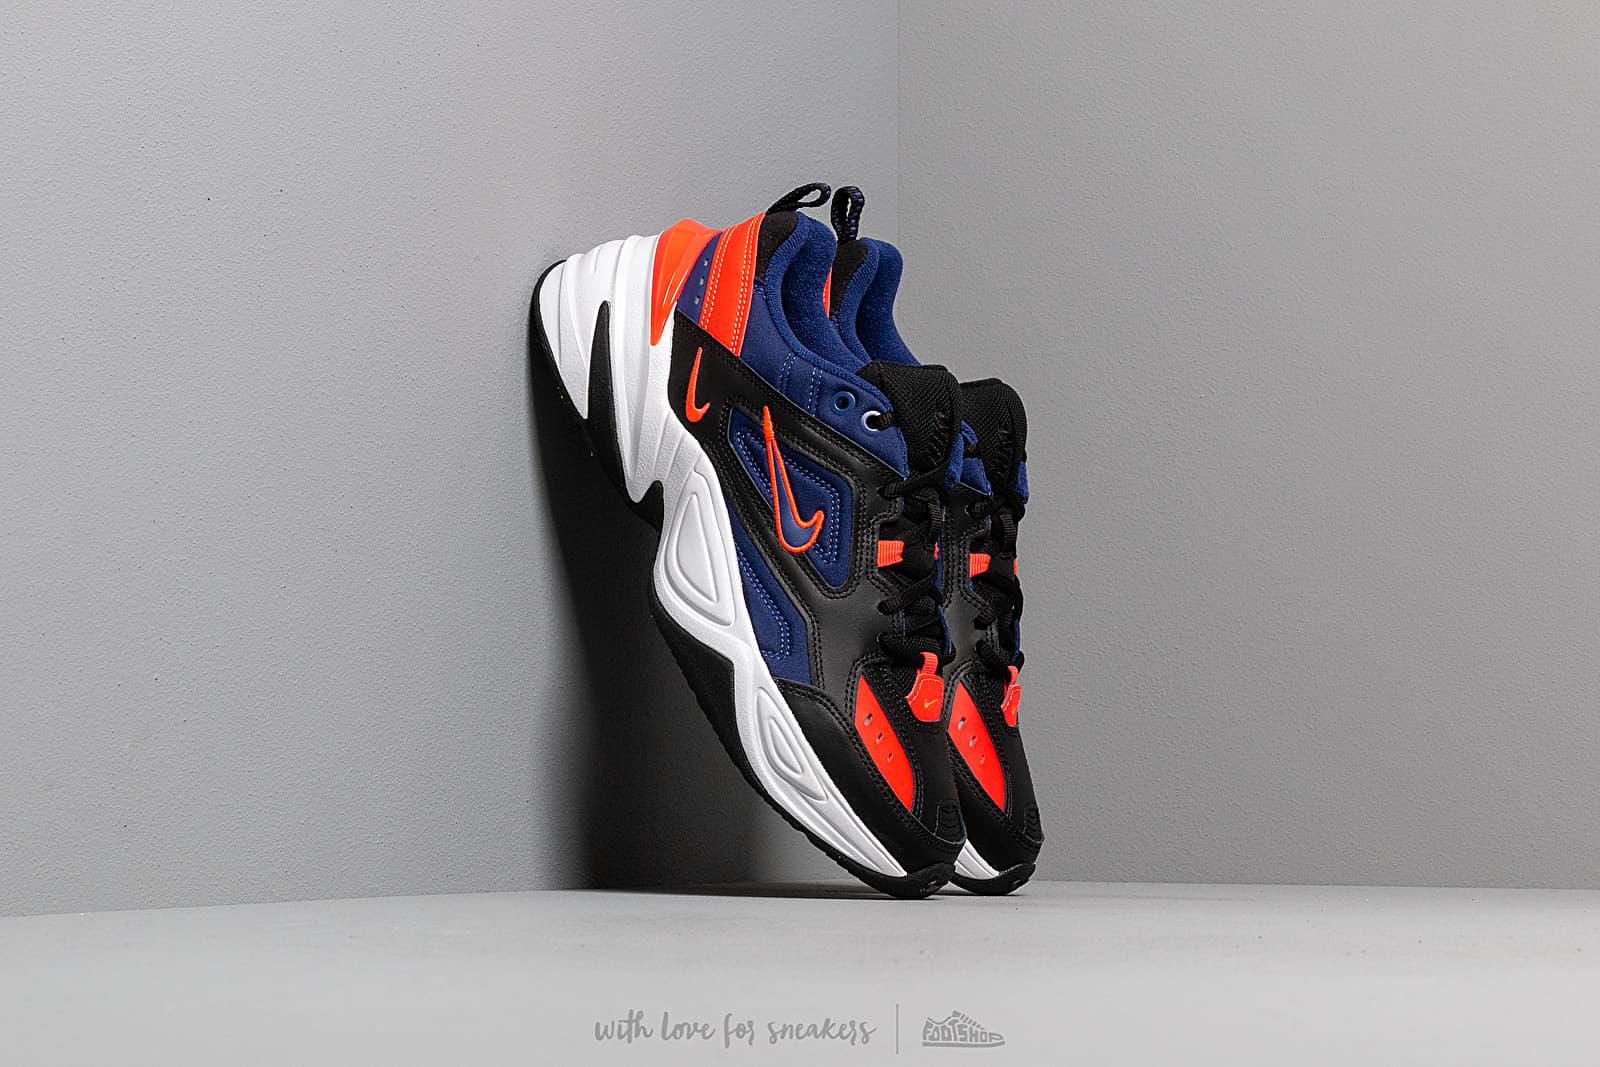 reputable site 9063a e5ac3 Nike M2K Tekno Black  Deep Royal Blue-Bright Crimson at a great price 95